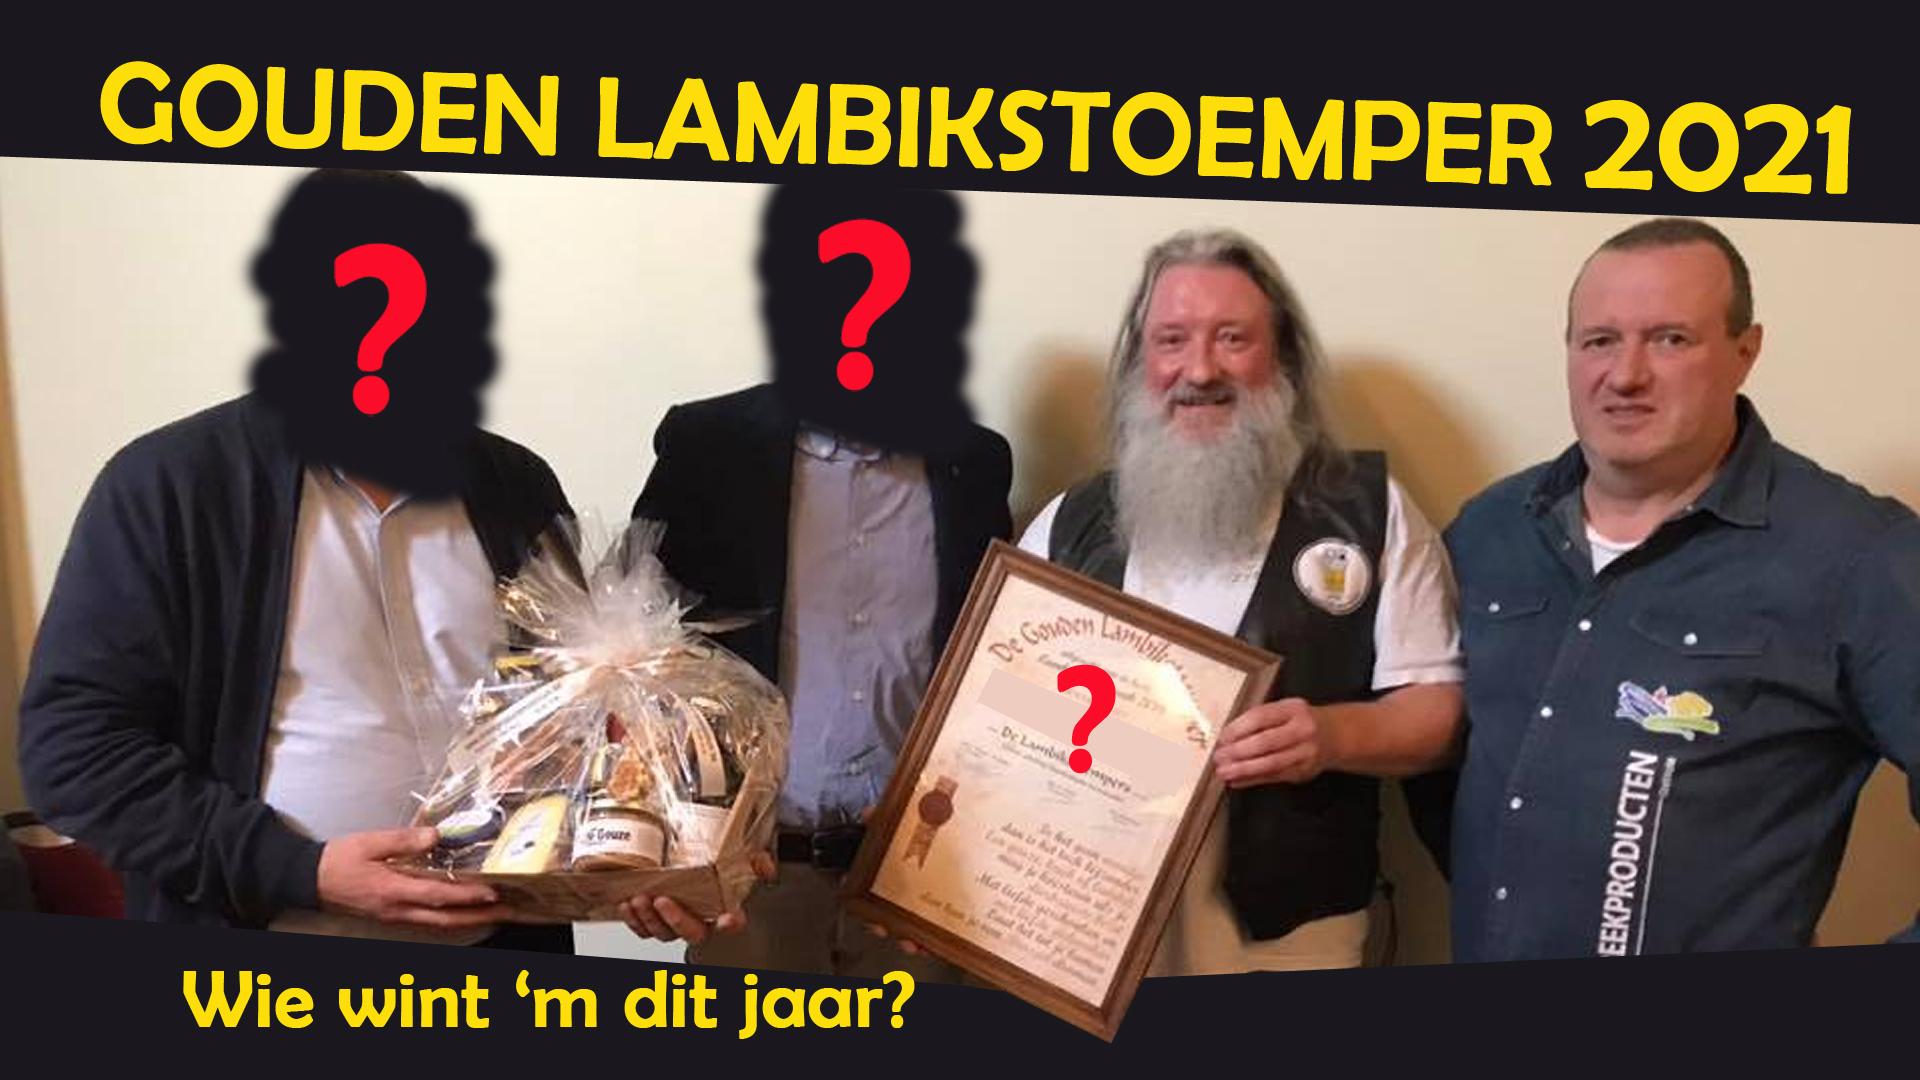 Presentation of the Golden Lambikstoemper 2021